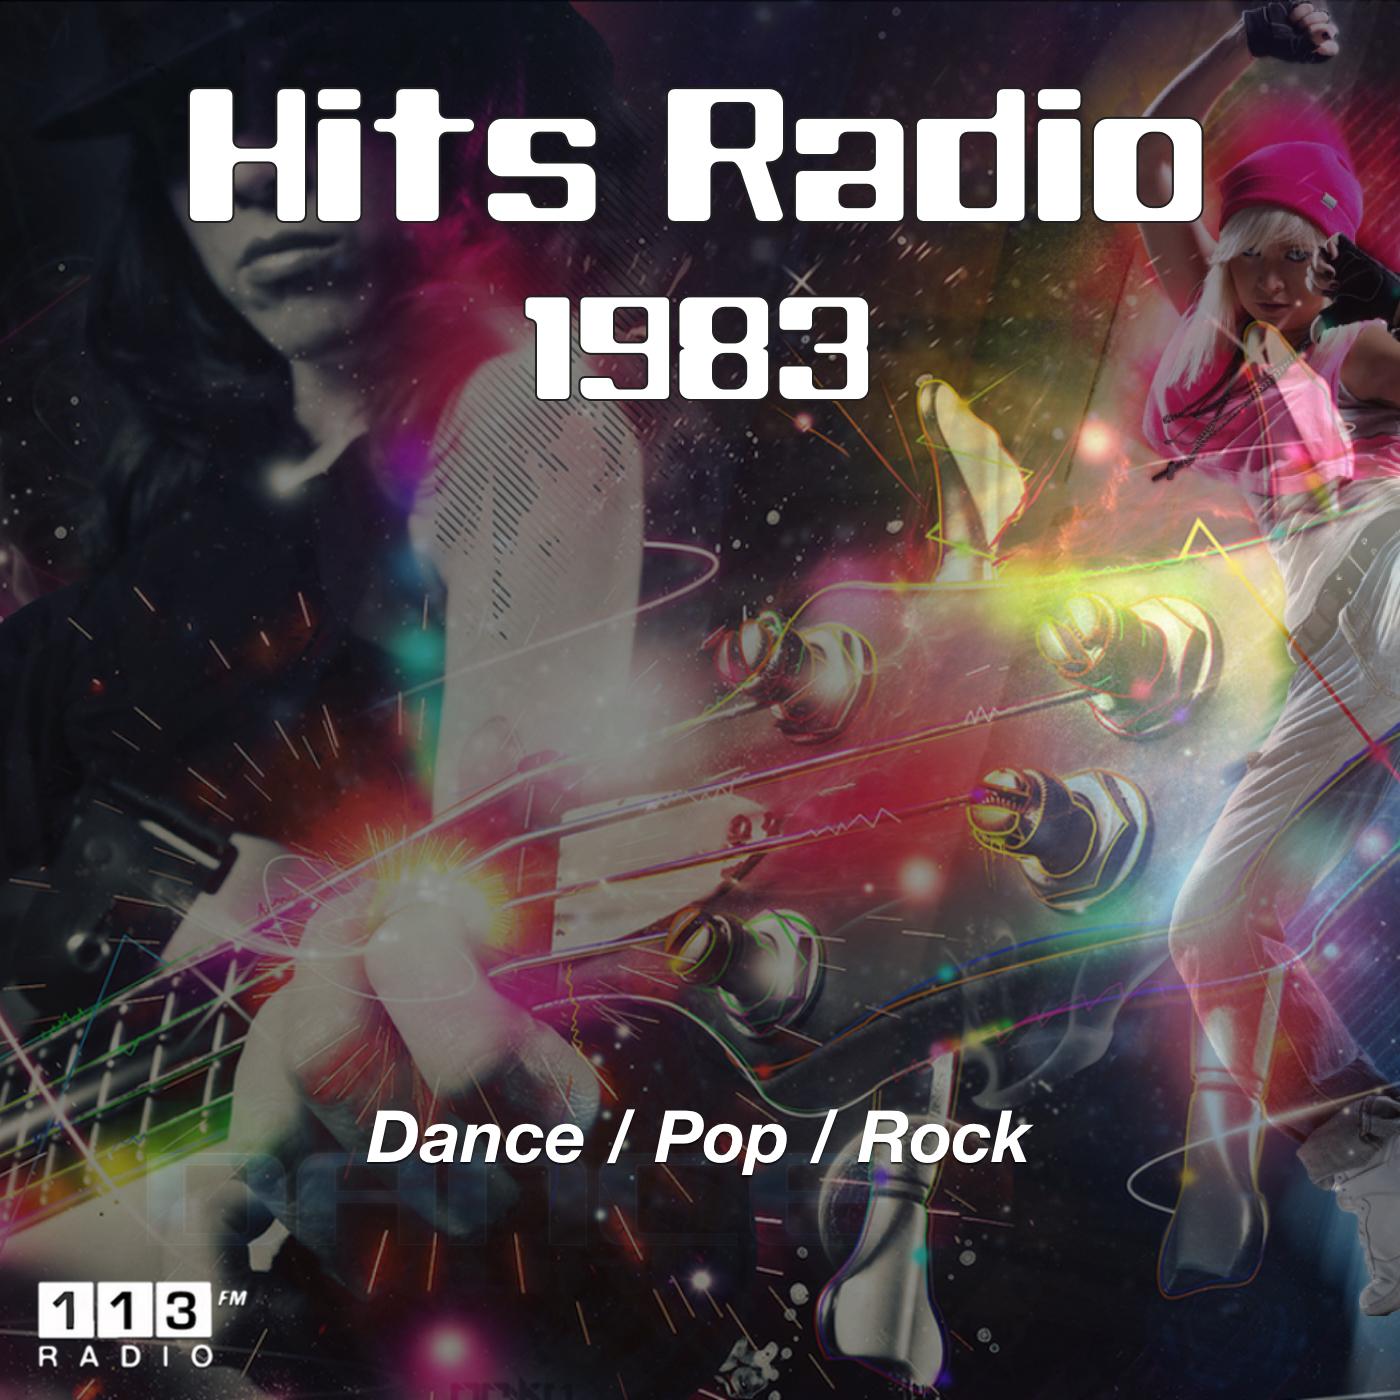 113.fm Hits Radio - 1983